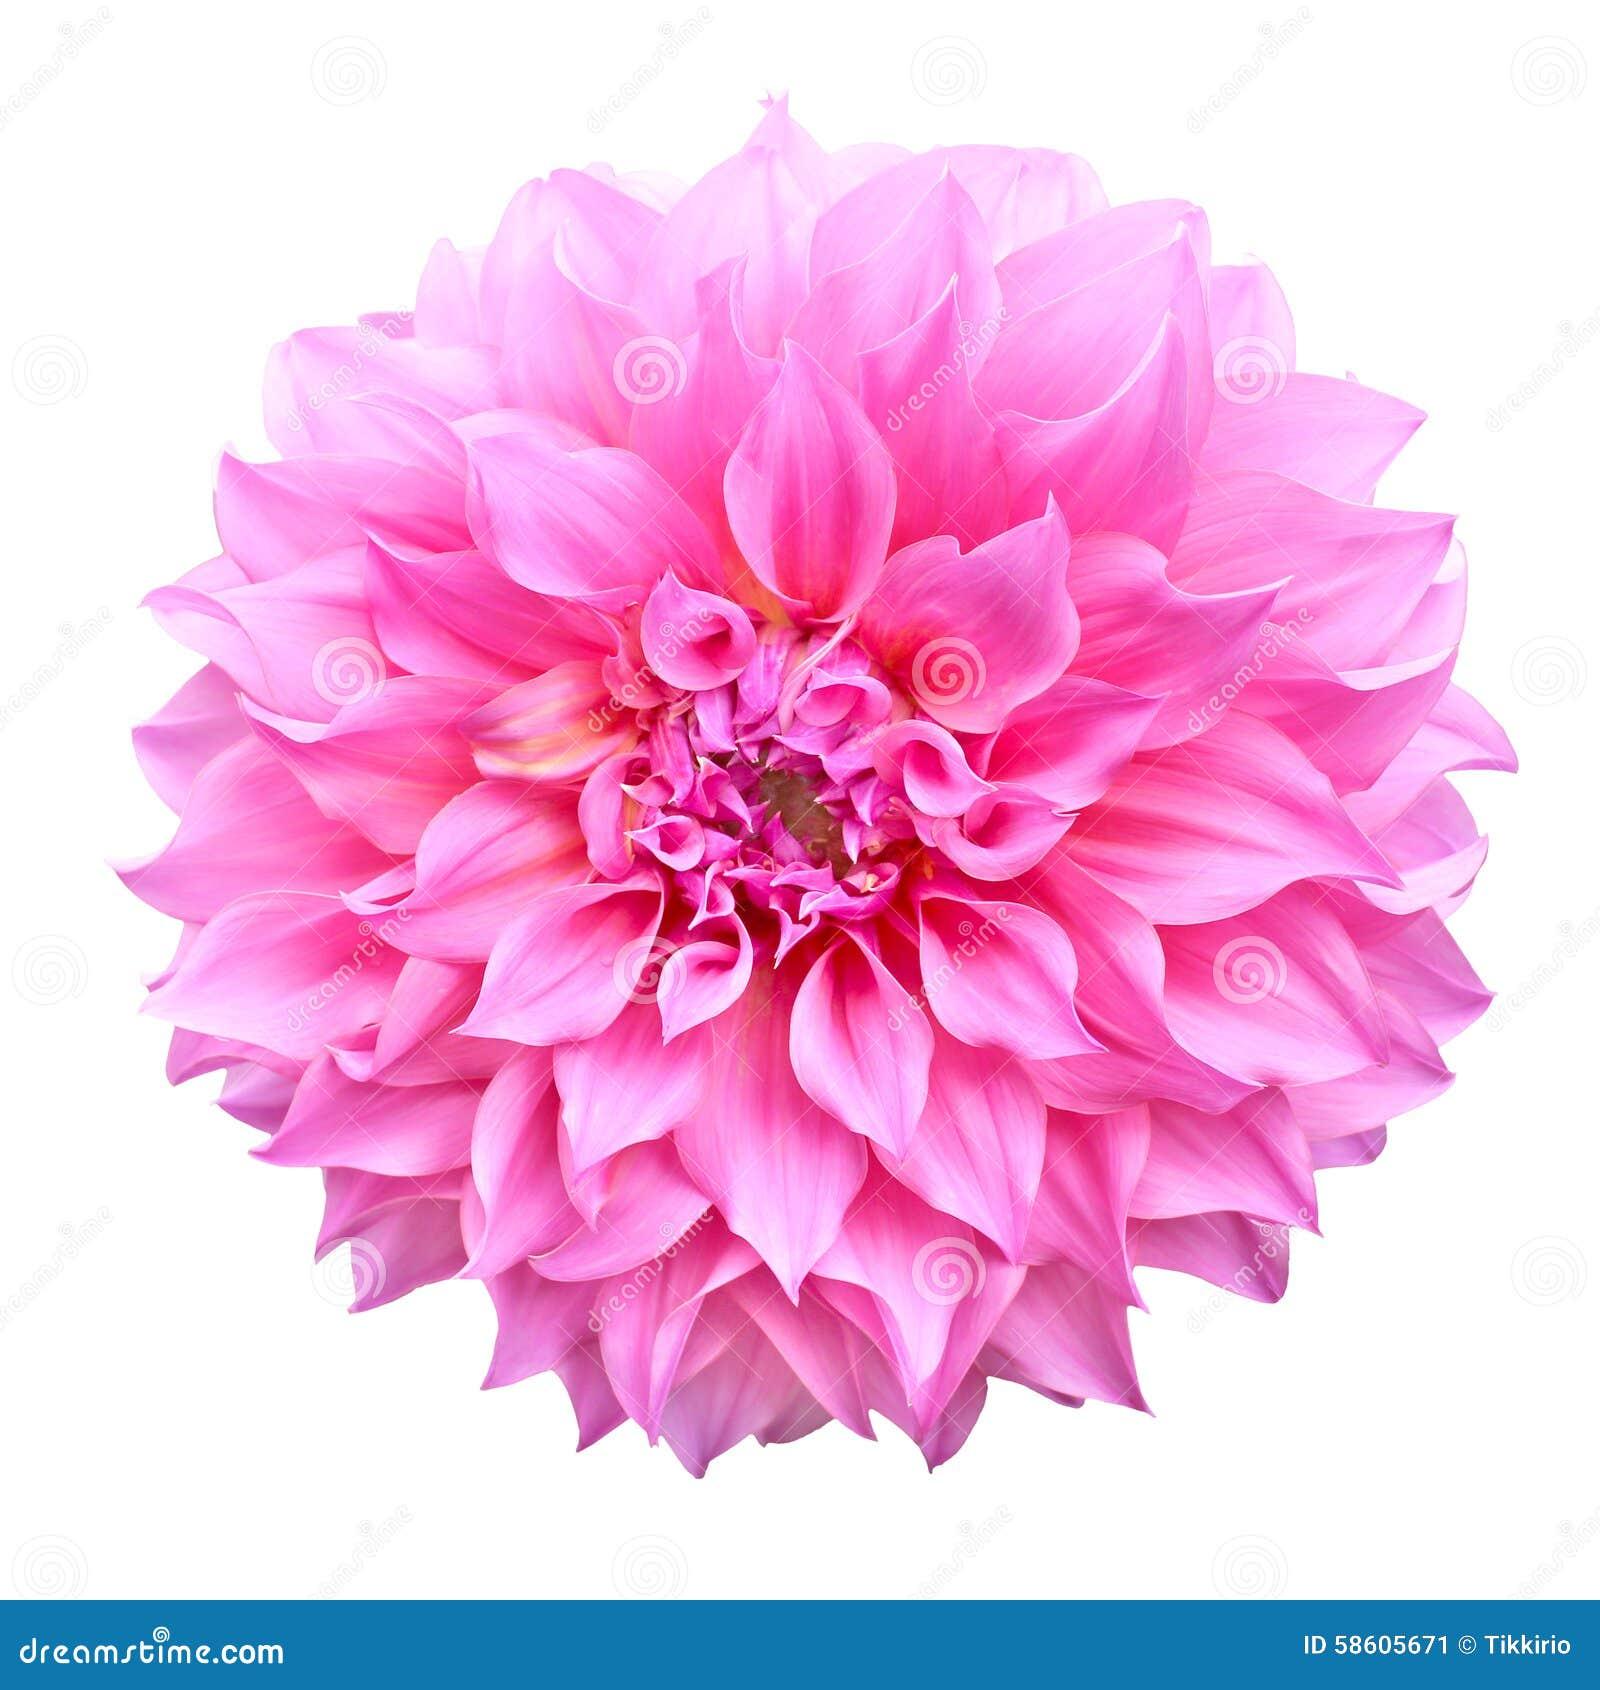 pink dahlia flower isolated on white background stock burgundy dahlia clipart dahlia clipart free